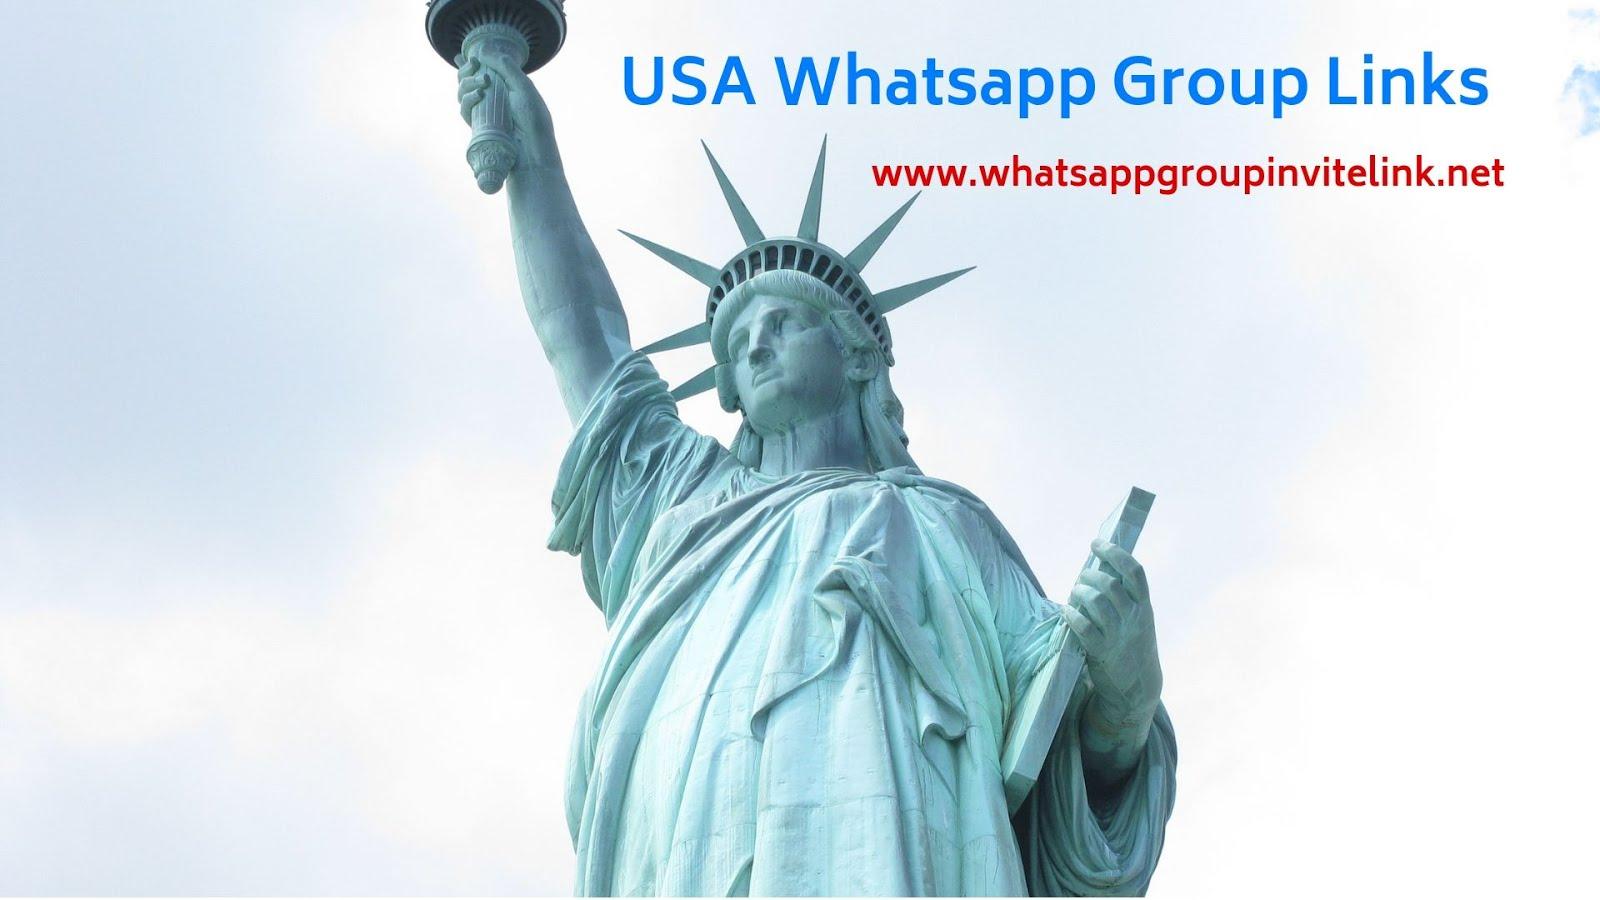 Whatsapp Group Invite Links: USA Whatsapp Group Links